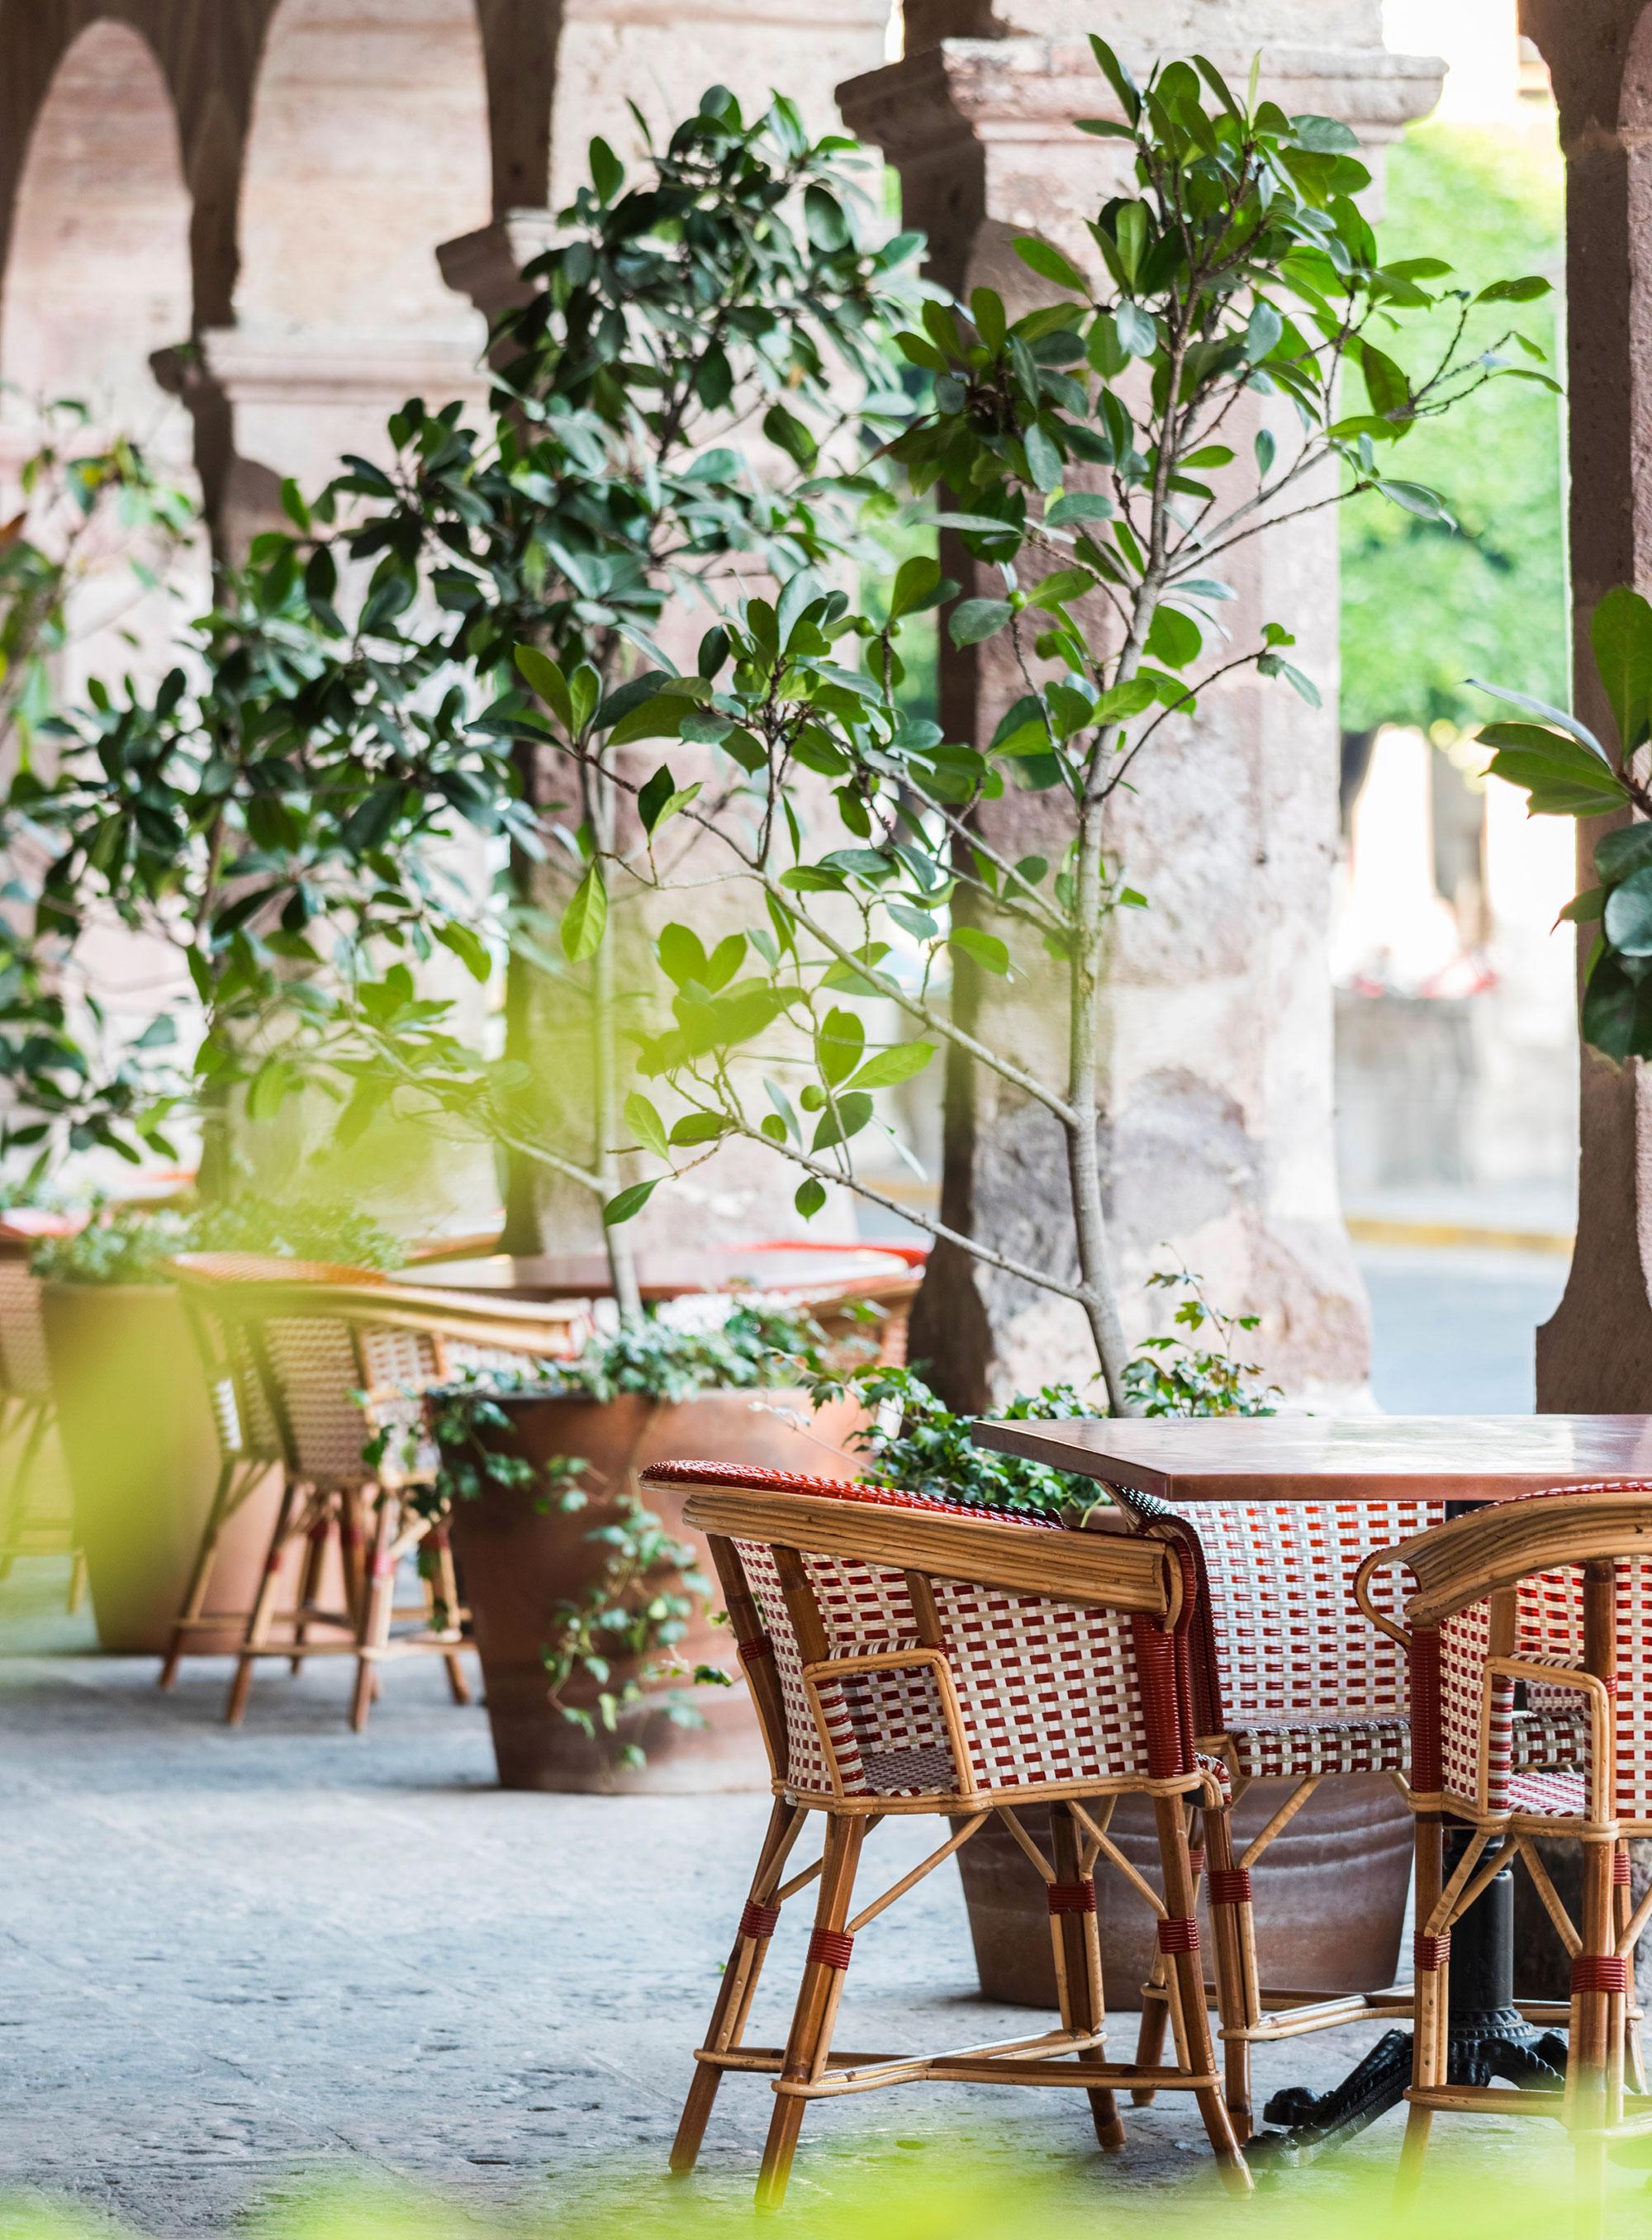 luis_laplace-Cafe_Michelena_Morelia-8